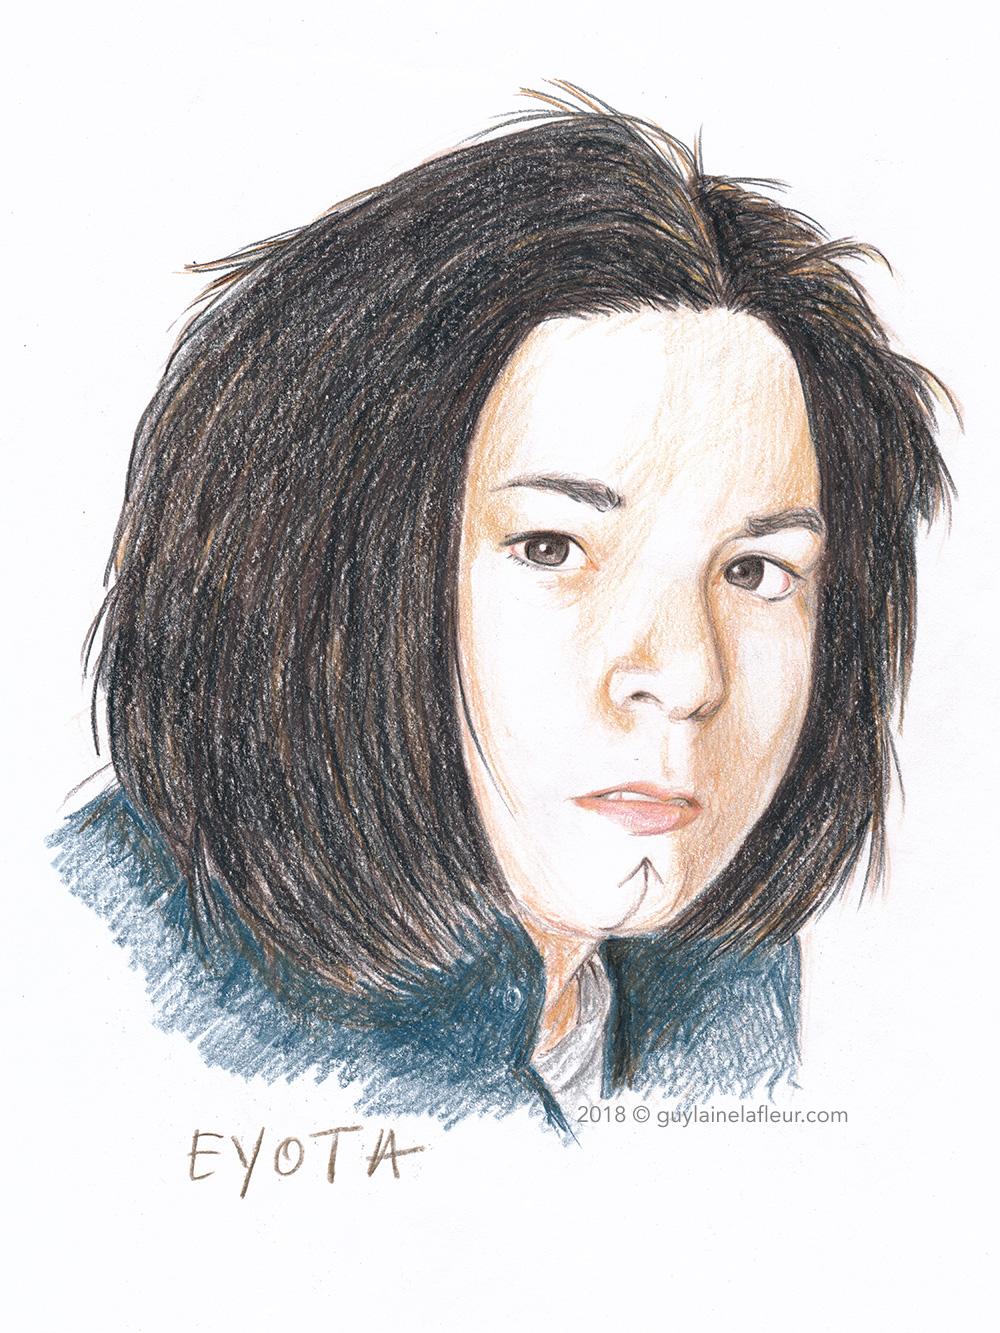 Eyota Standing Bear  - Natasha Kanapé Fontaine